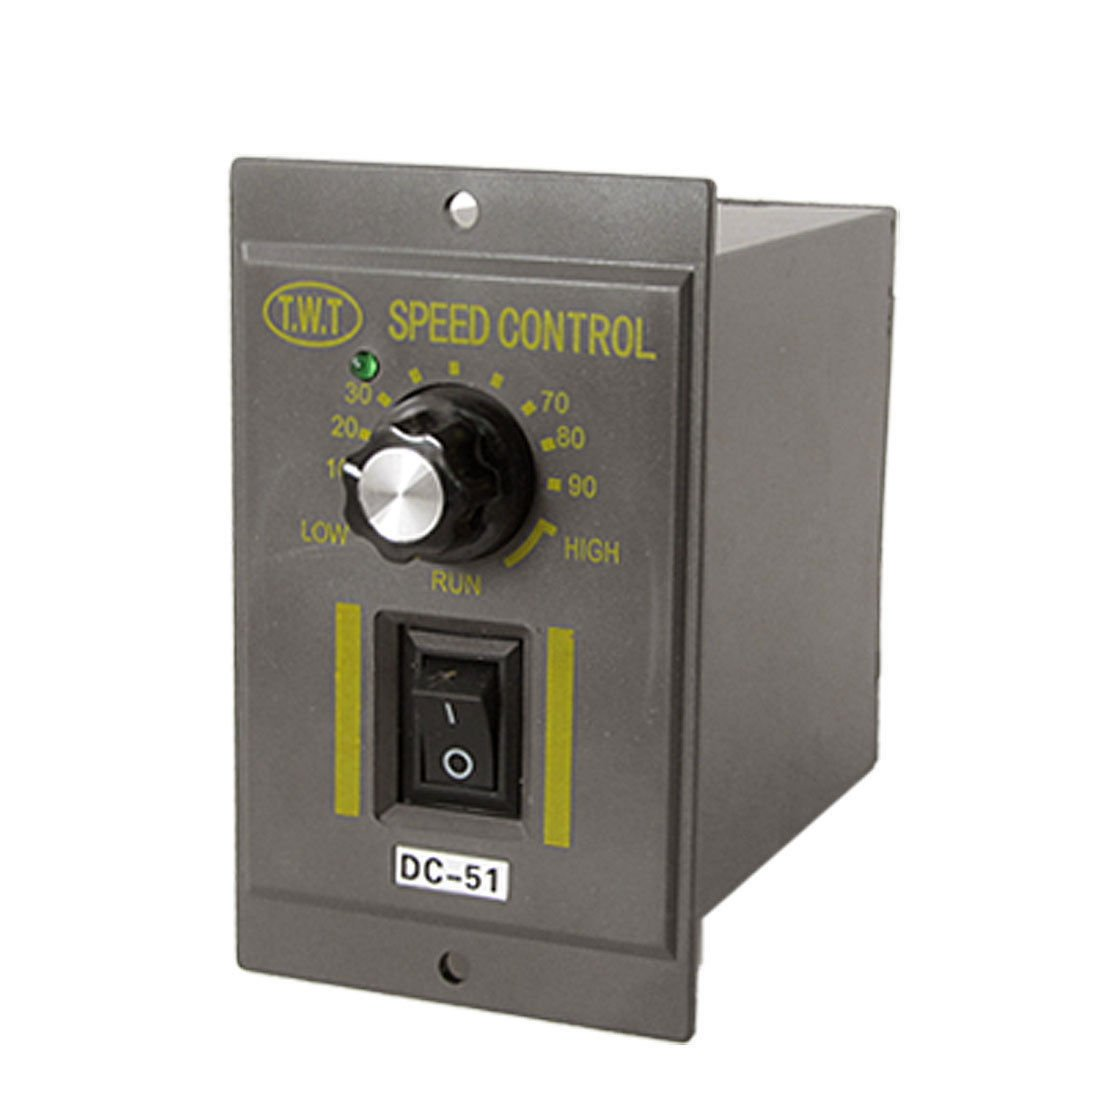 DC-51 DC 90V AC 220V Gear Motor Speed Control Switch